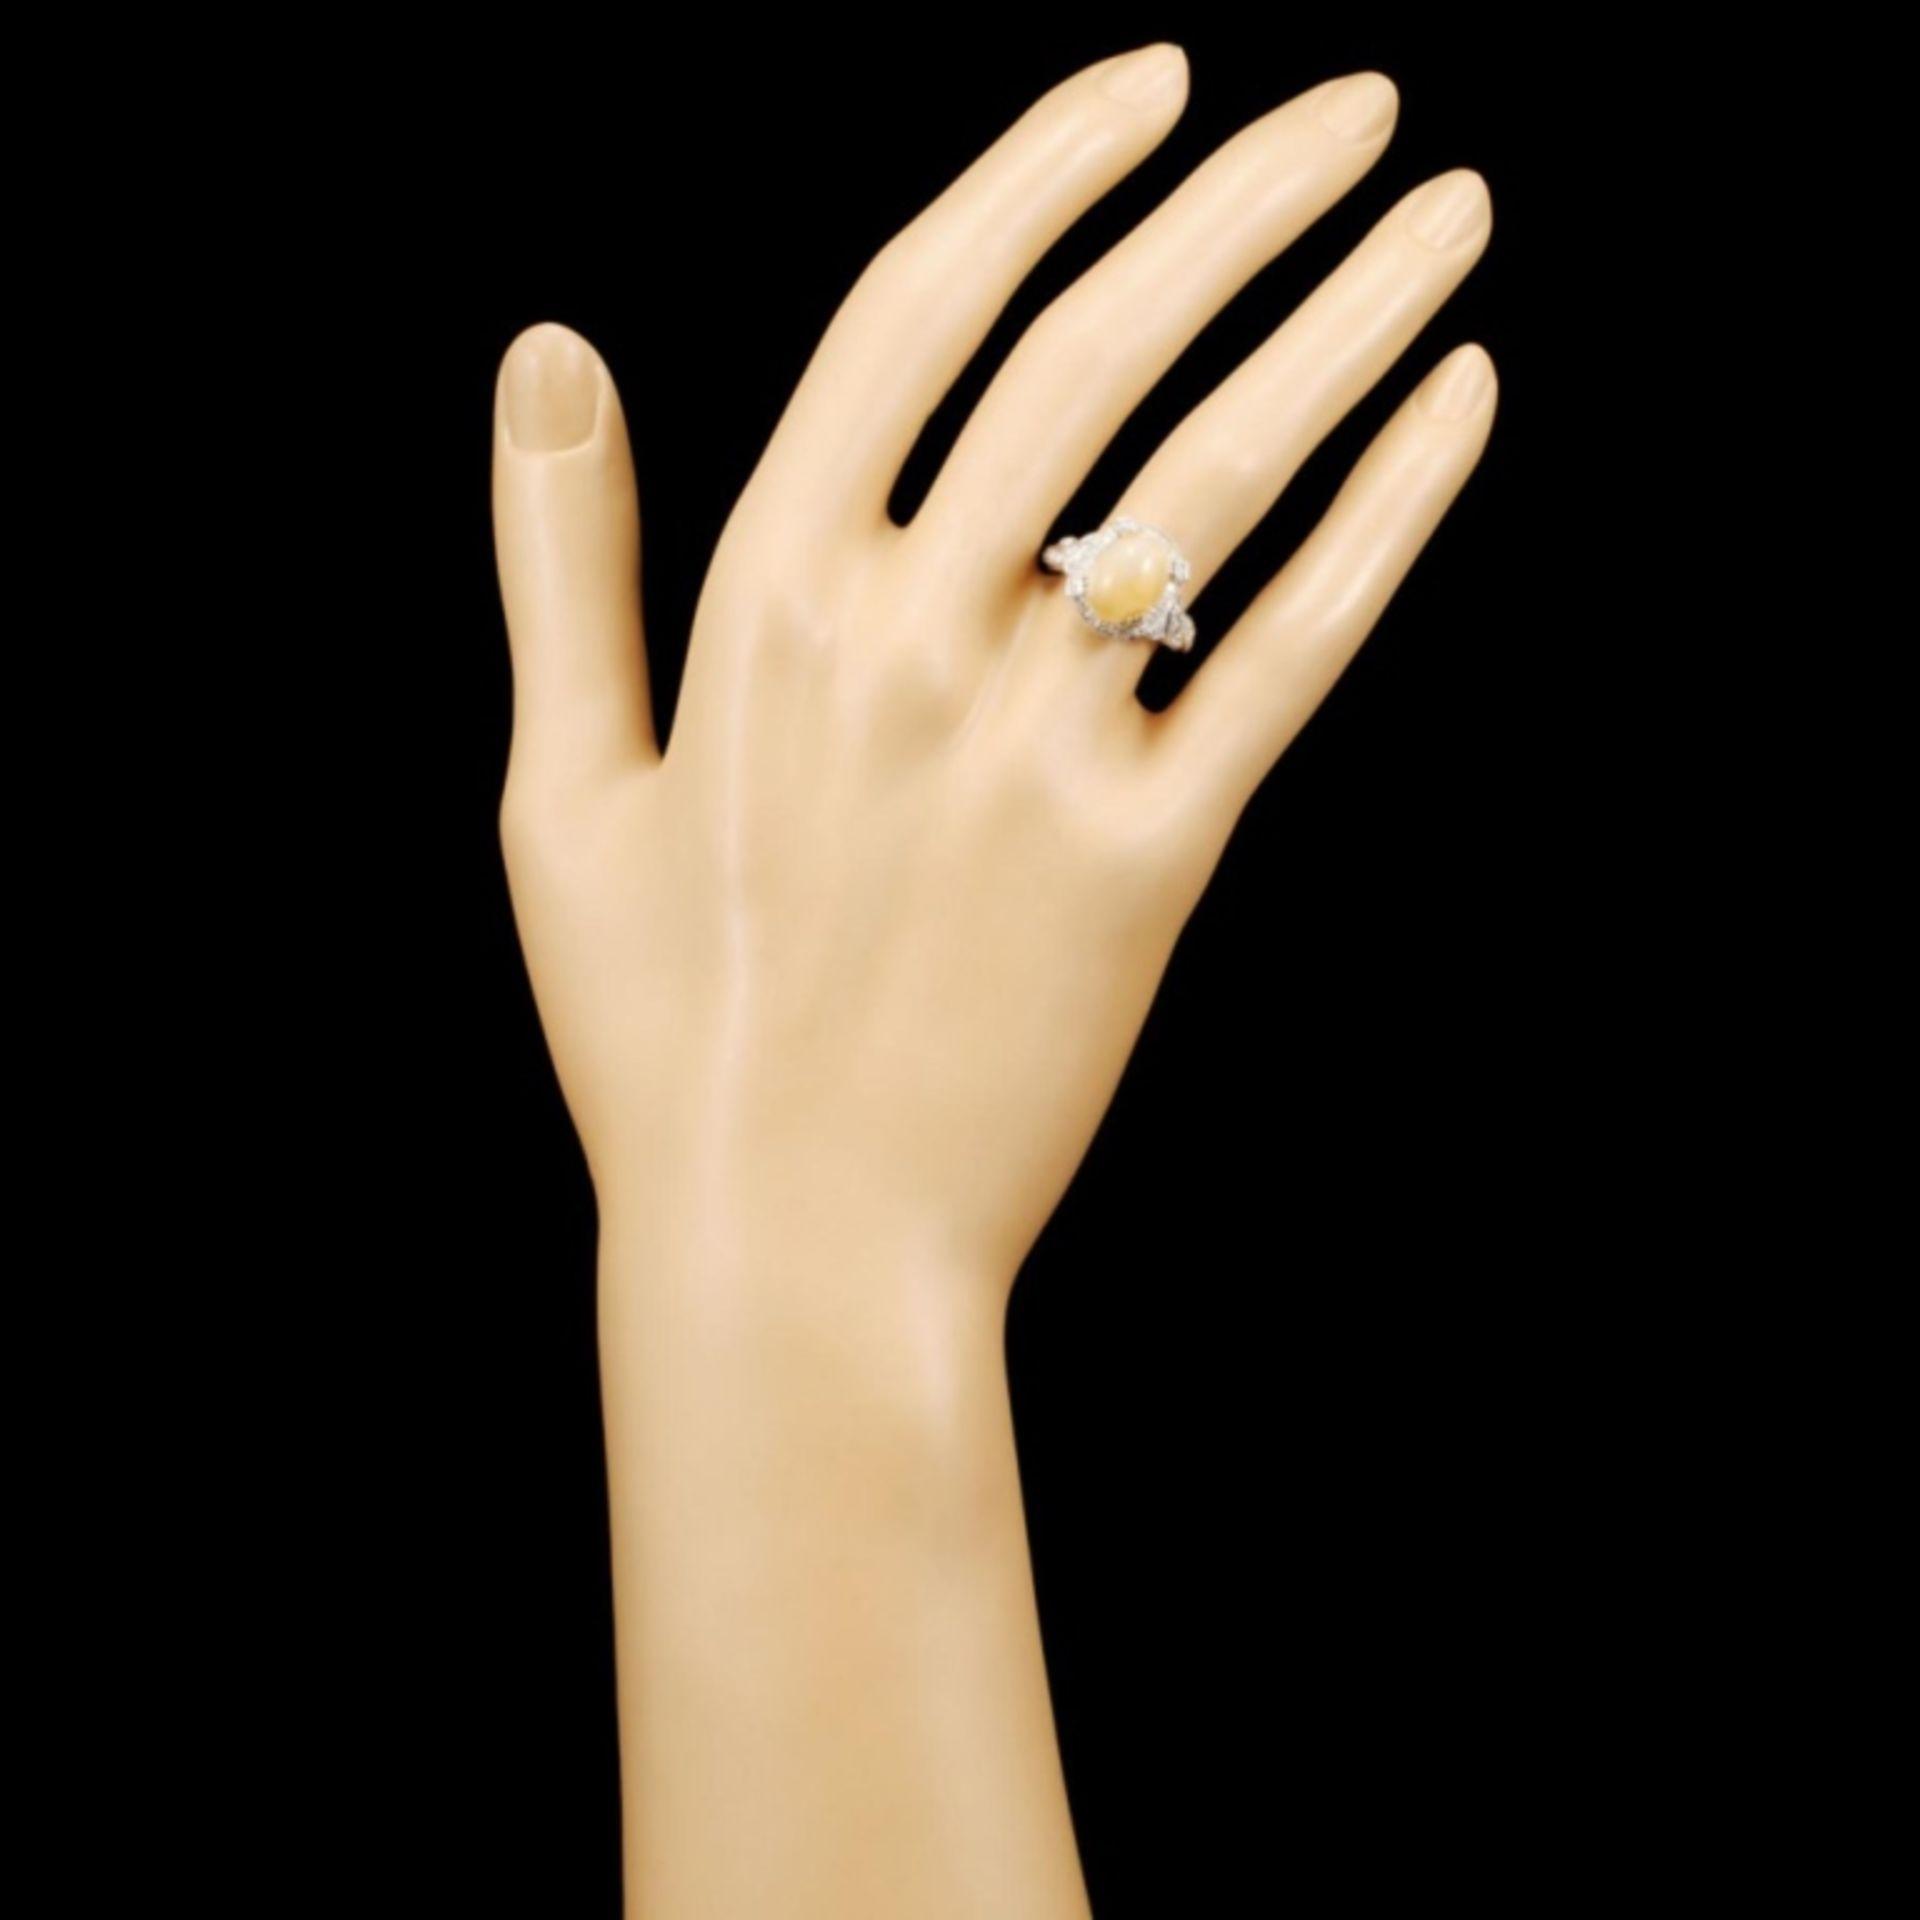 18K Gold 2.14ct Opal & 0.48ctw Diamond Ring - Image 4 of 5